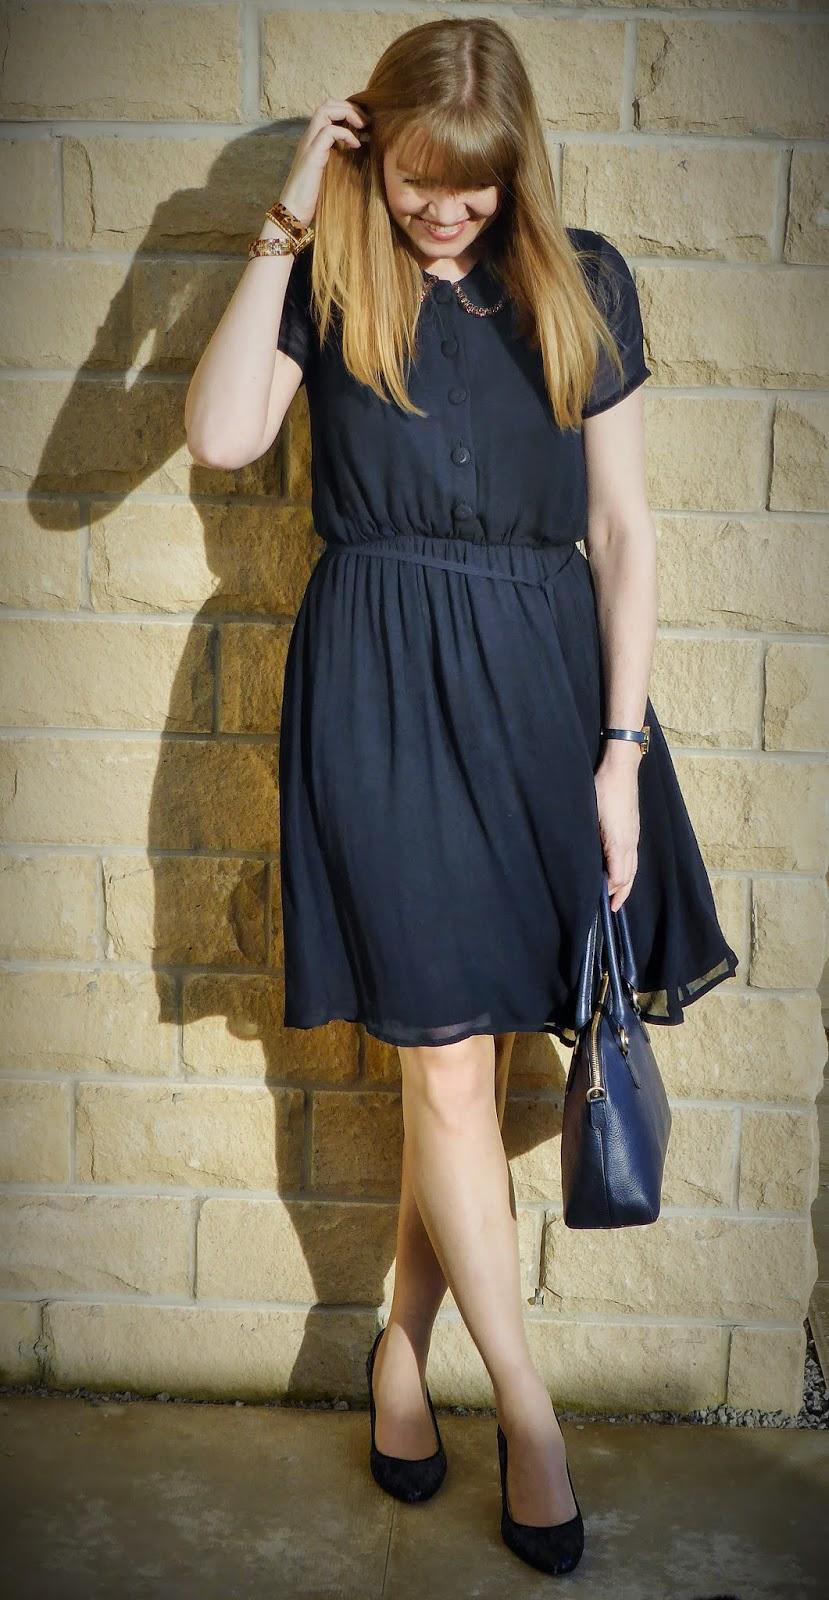 Navy Allium B dress with beaded collar, navy sequinned shoes, navy handbag